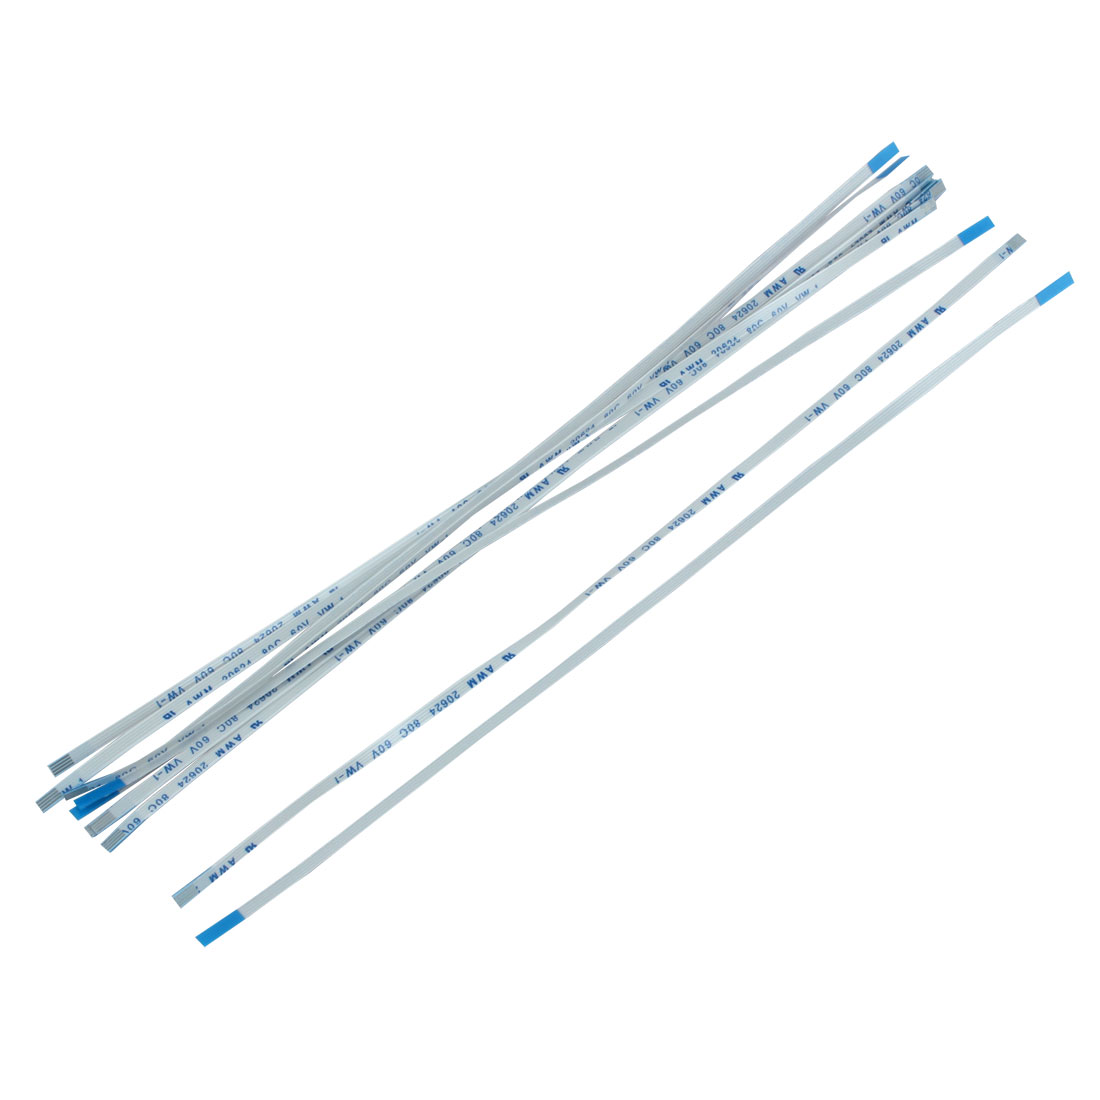 10Pcs 0.5mm Pitch 4 Pin AWM 20624 80C 60V VW-1 Flexible Flat Cable FFC 200mm